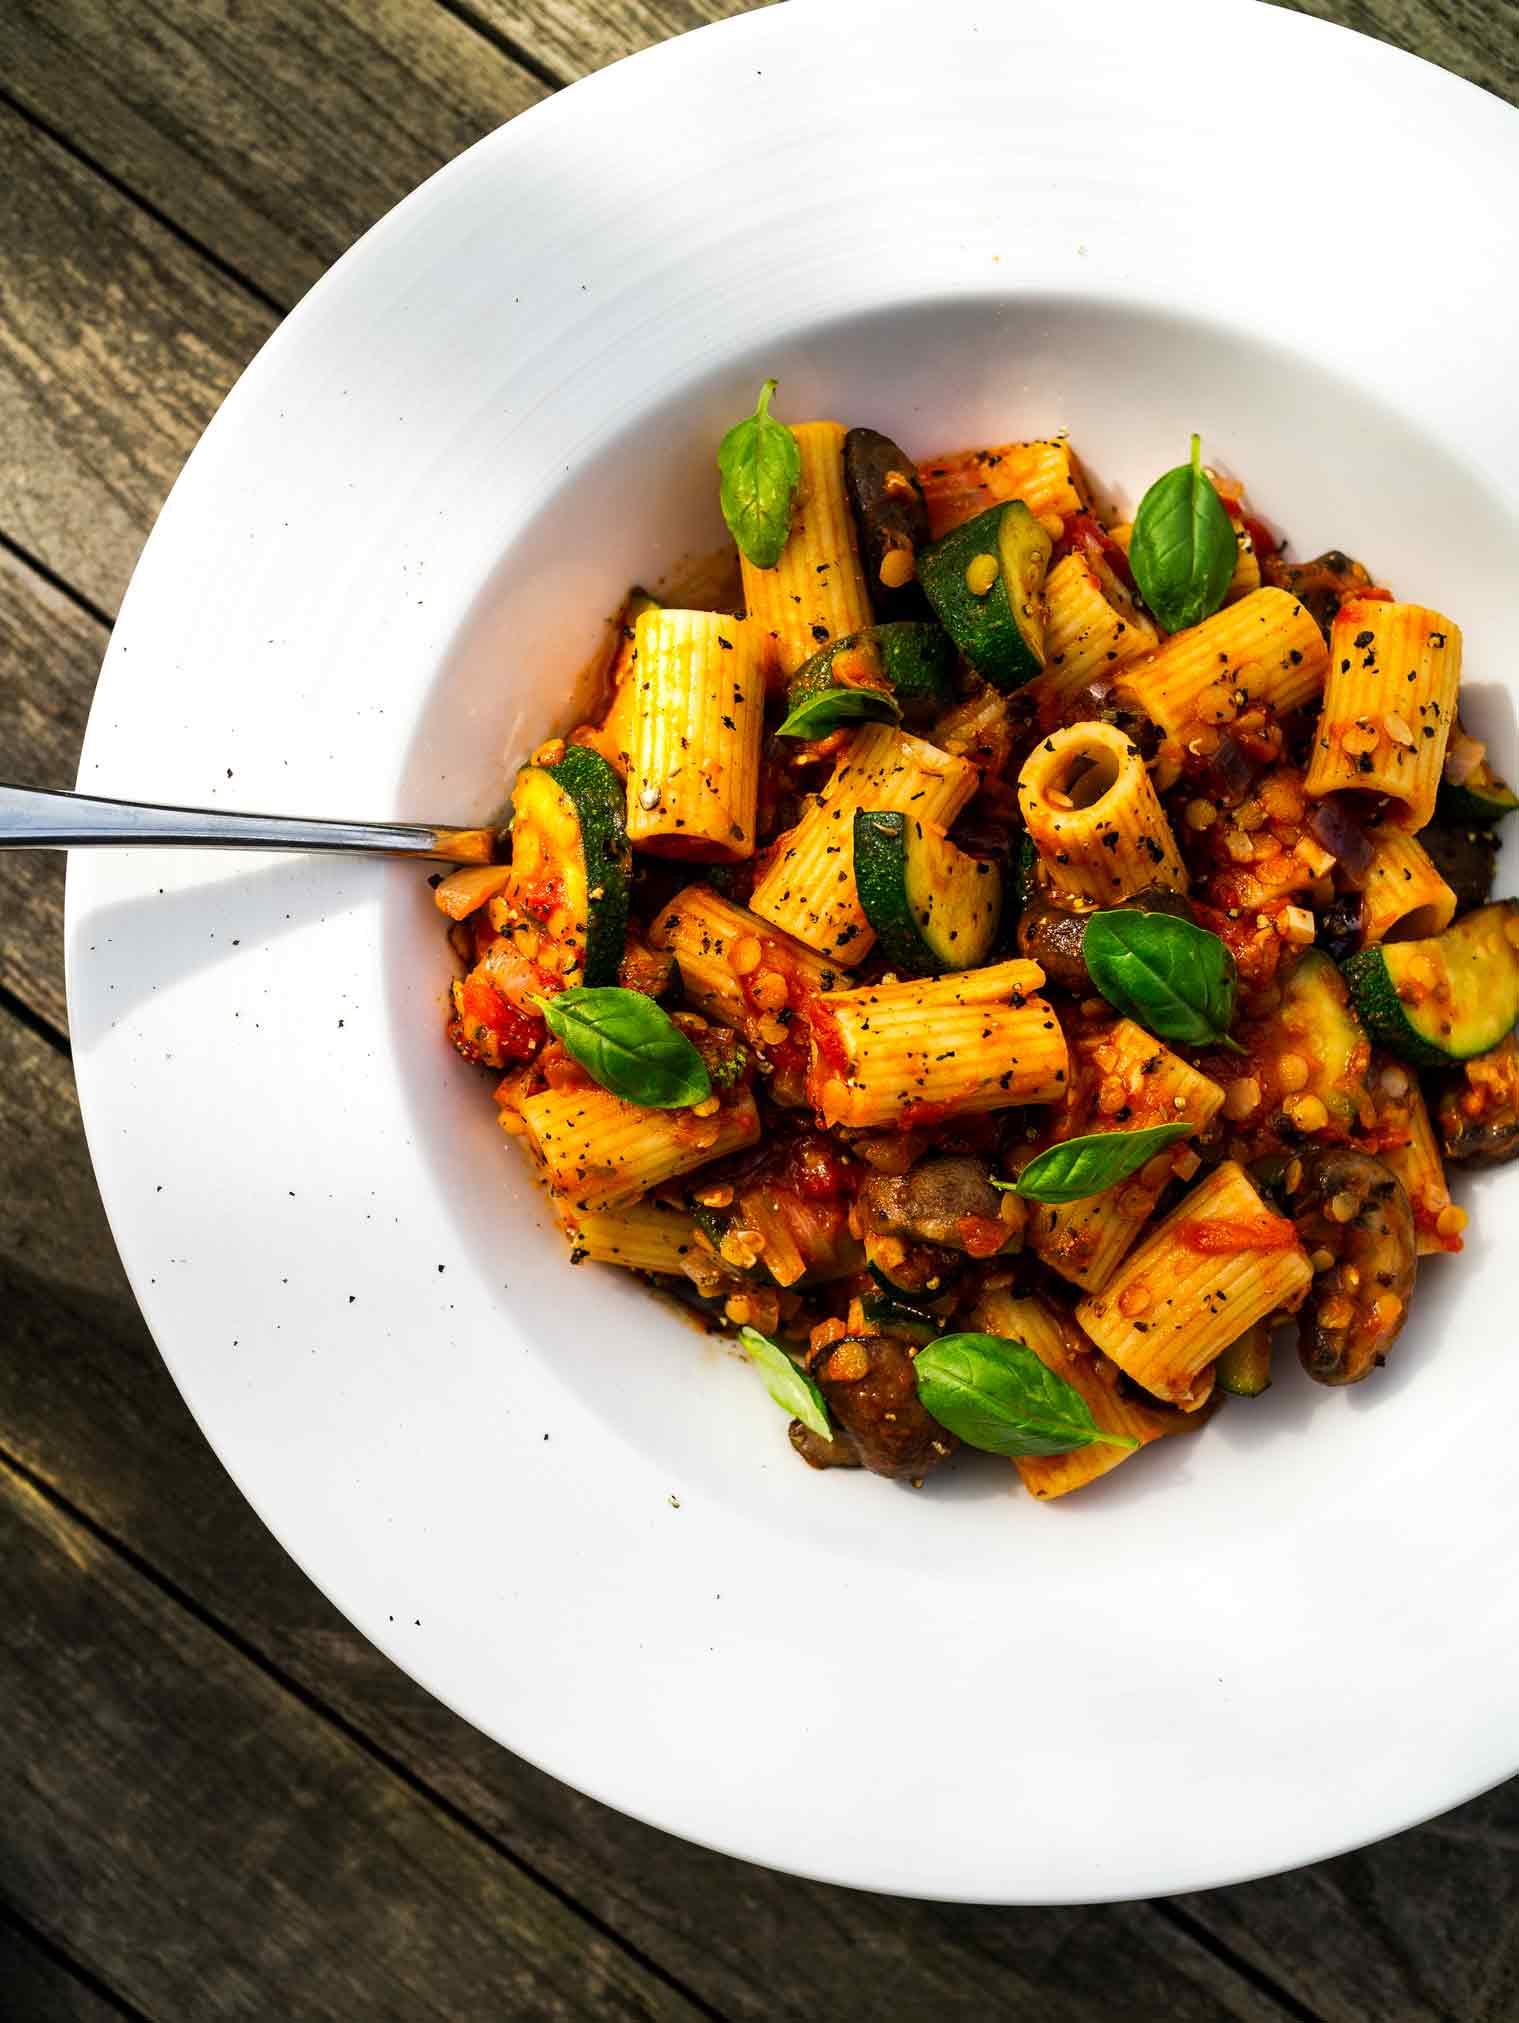 Summery Vegetable Rigatoni -delicious light vegan pasta recipe w/tomato lentil sauce    #summer #zucchini #mushroom #vegetarian #recipes